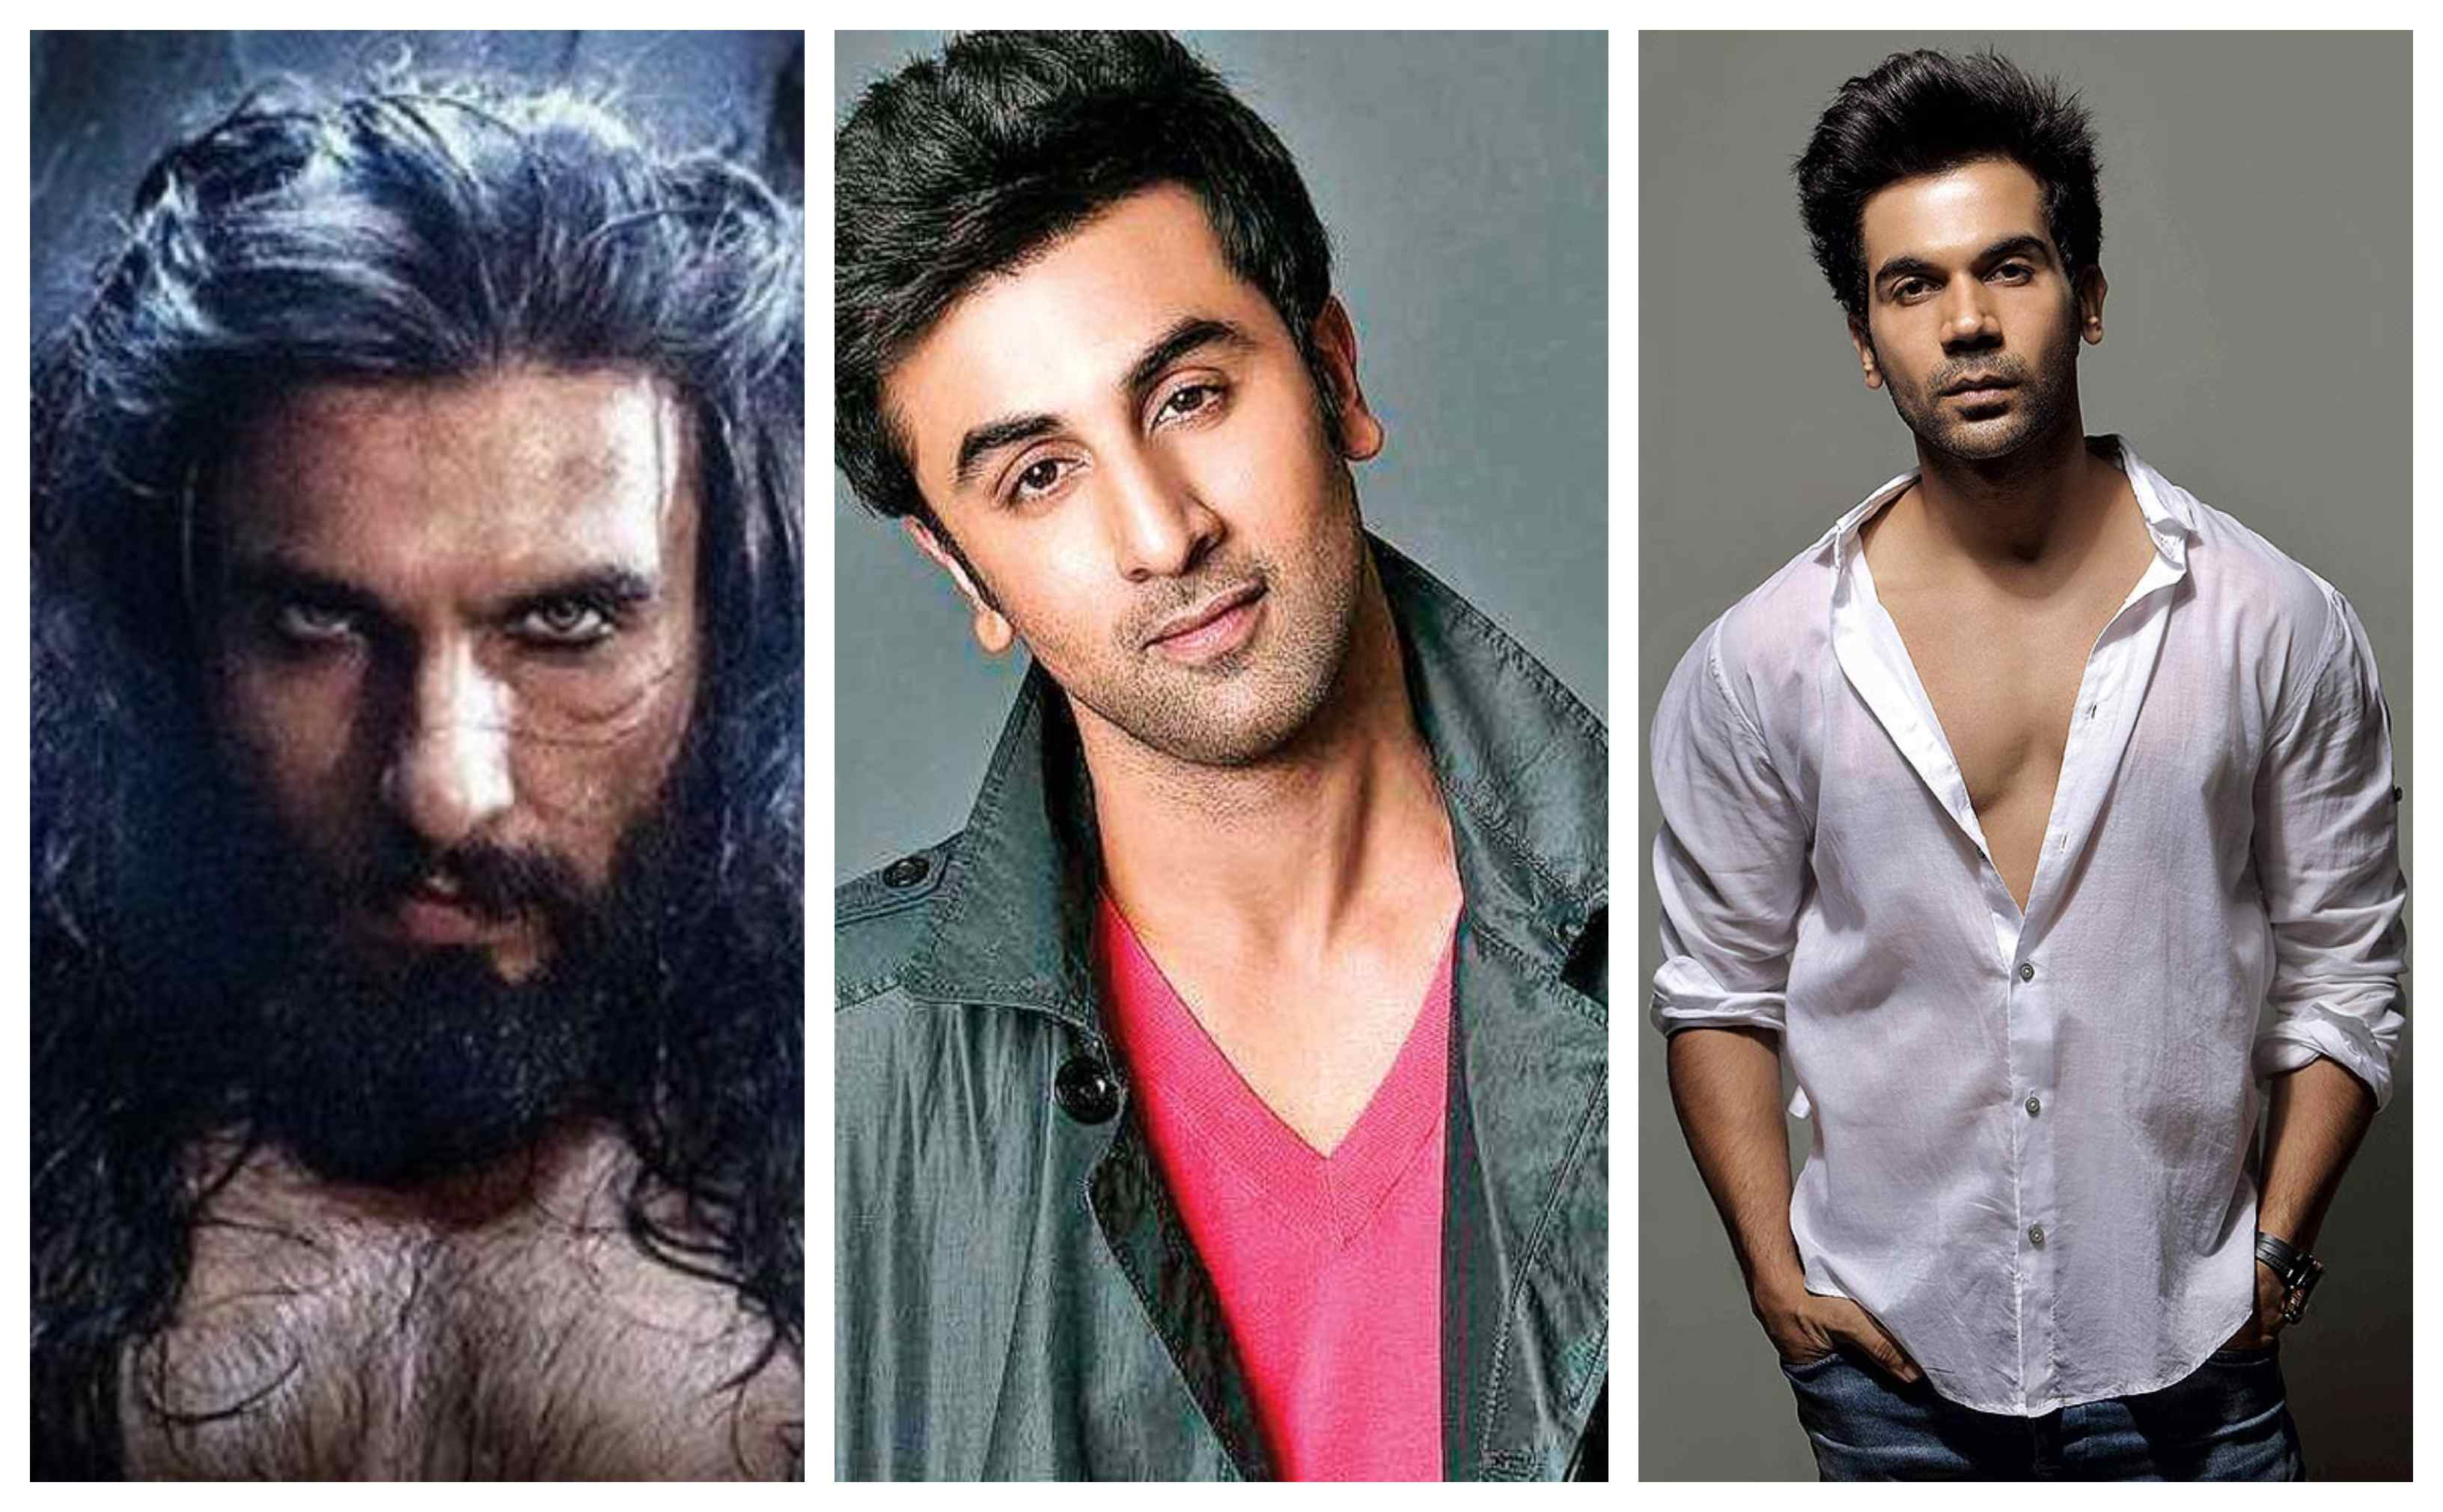 Rajkumar Rao compared to Ranveer Singh and Ranbir Kapoor